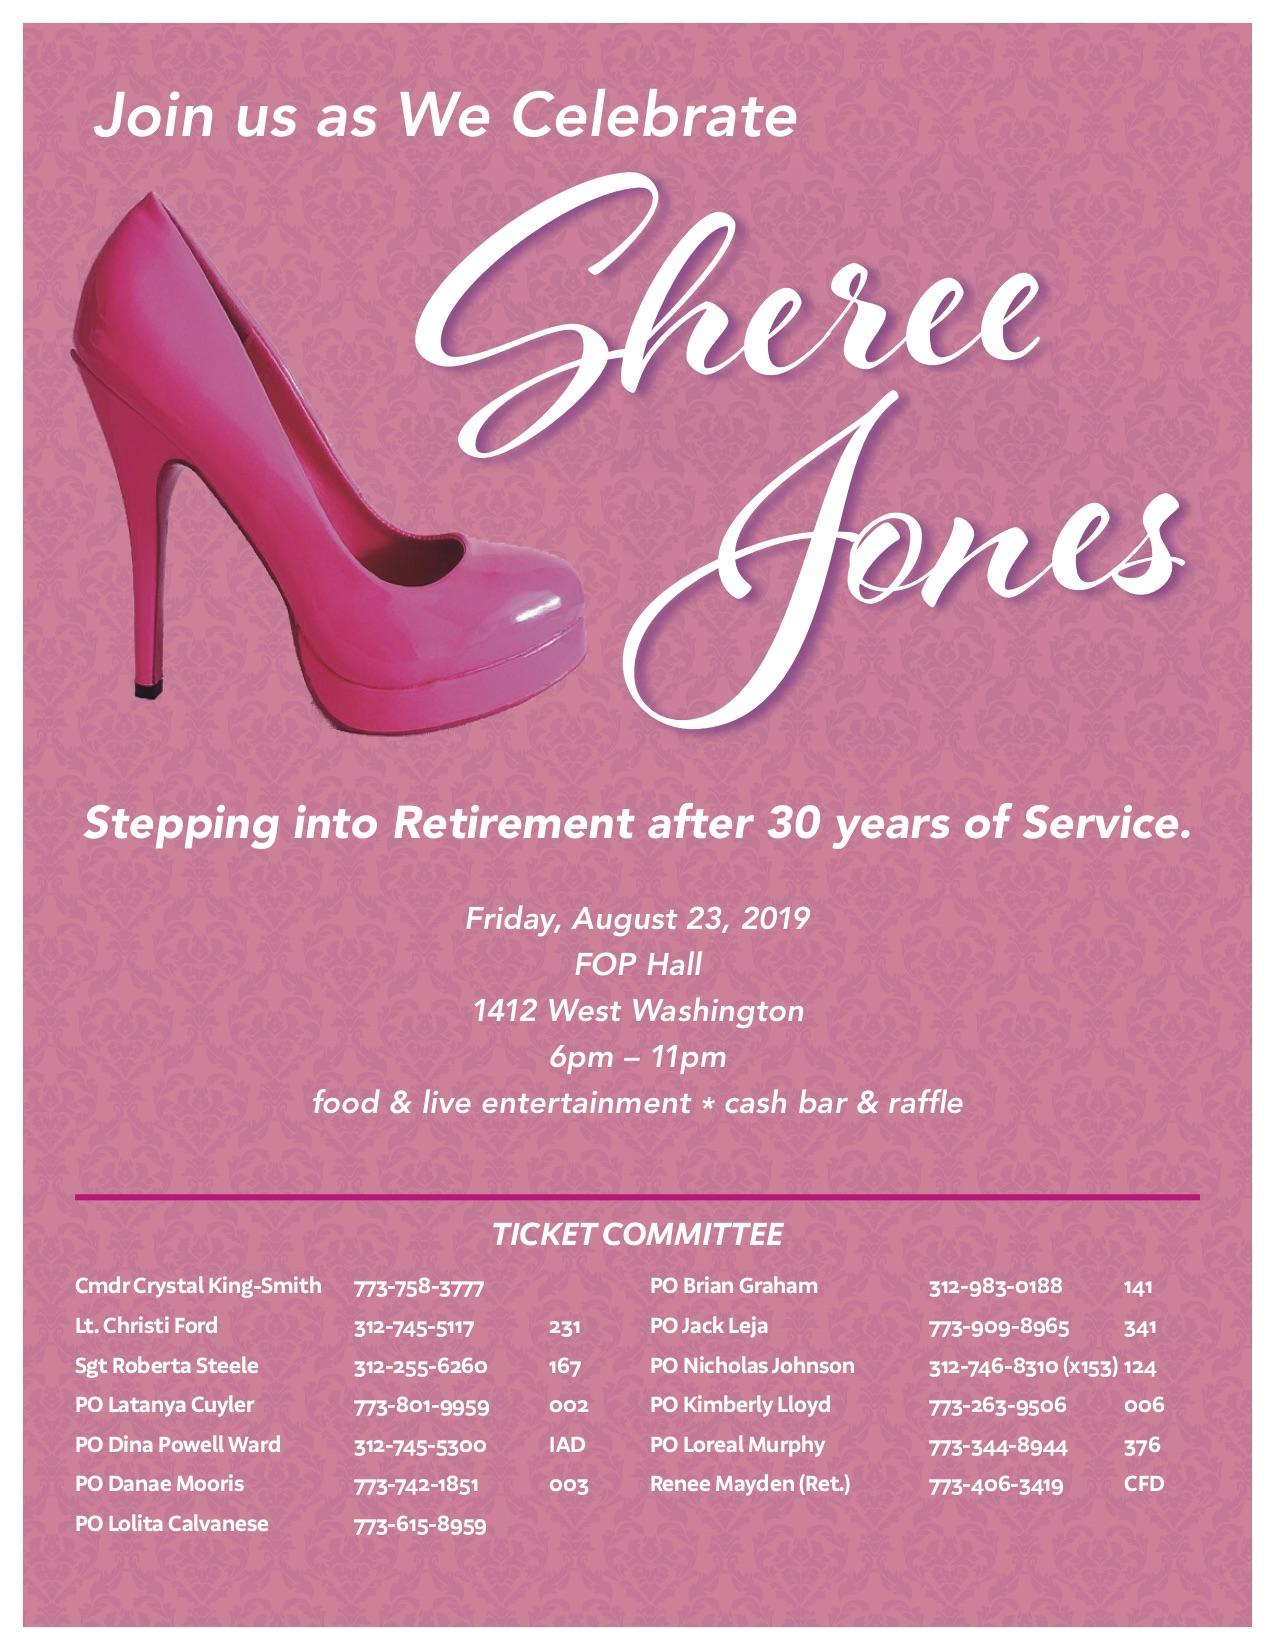 Sheree Jones Poster.jpg